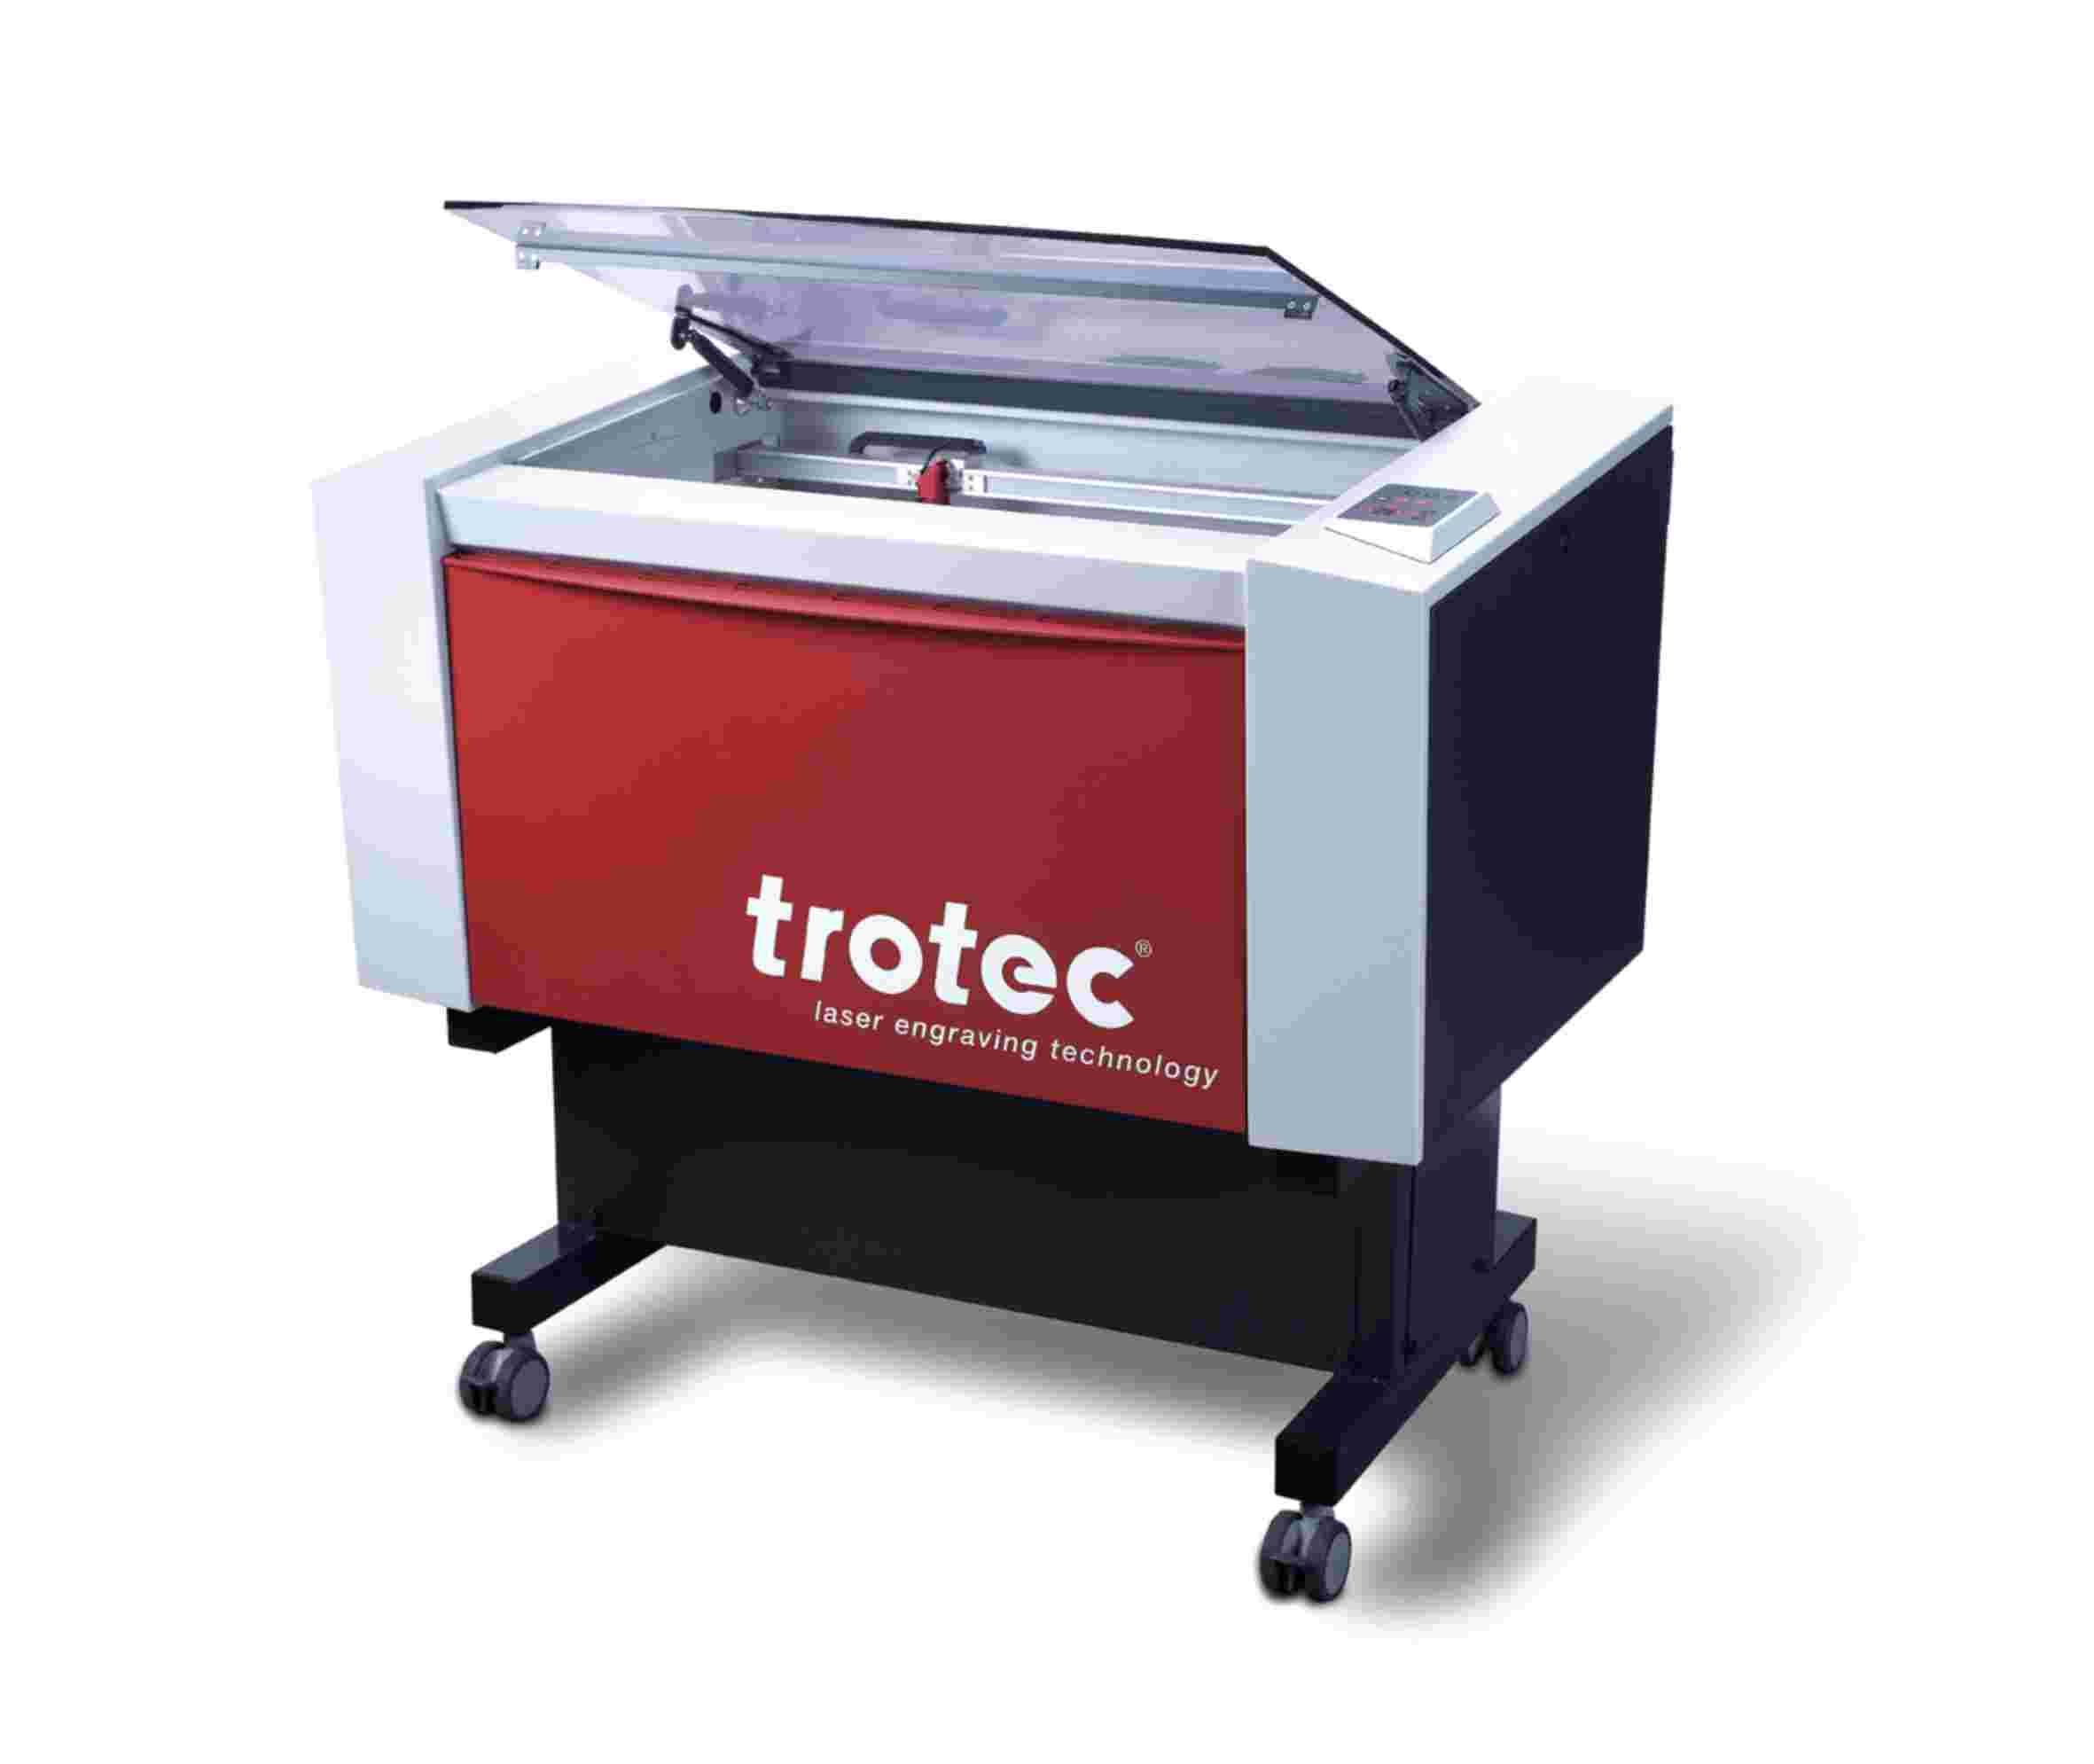 machine gravure decoupe verre machine laser sp300. Black Bedroom Furniture Sets. Home Design Ideas